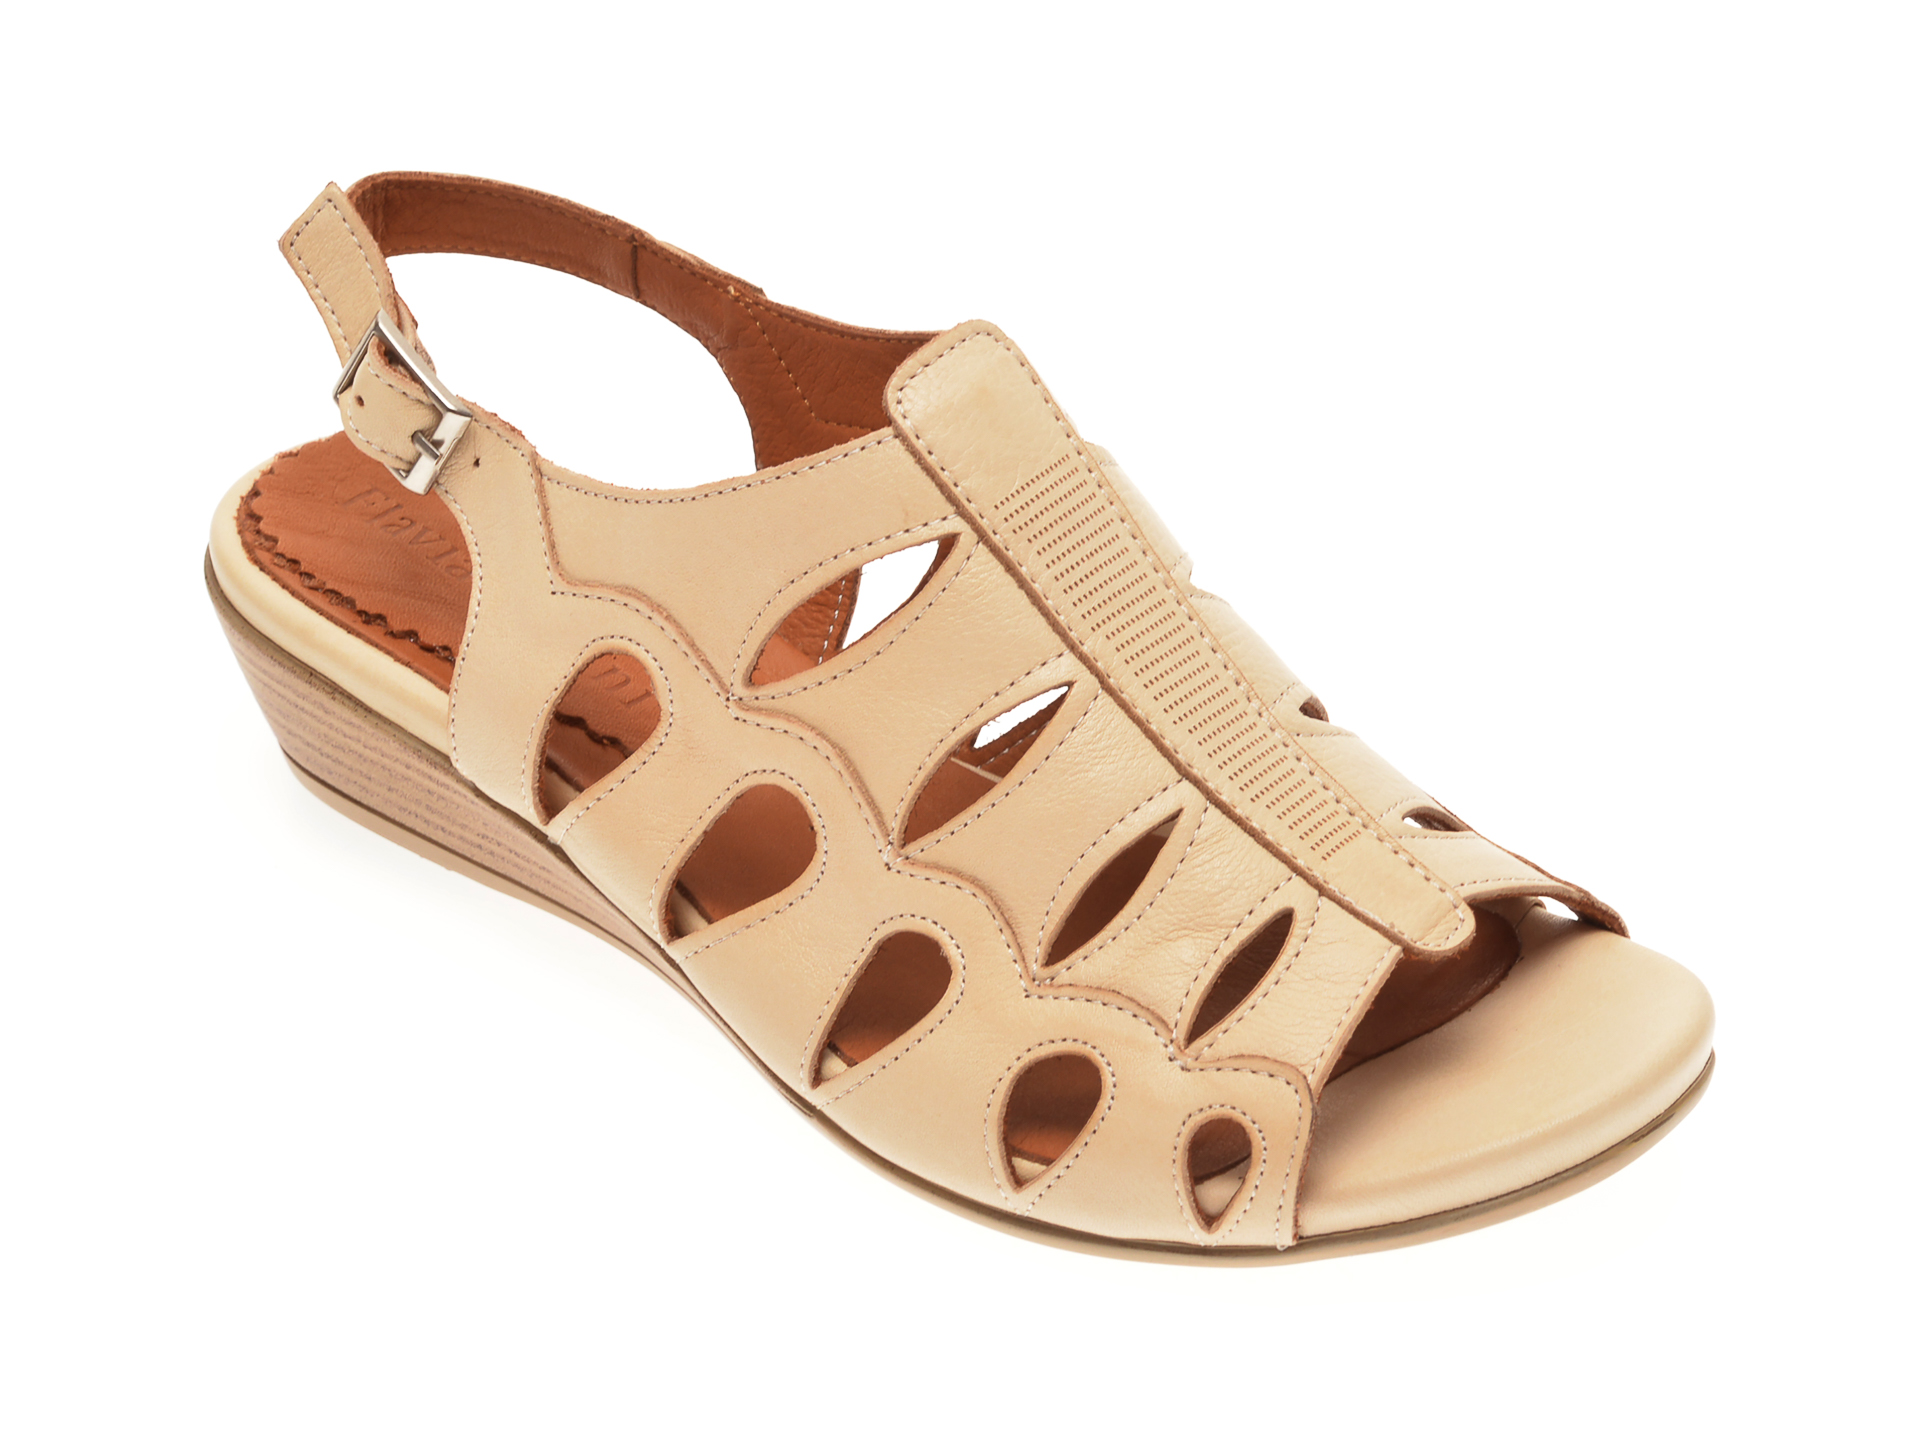 Sandale FLAVIA PASSINI bej, 125Y3, din piele naturala